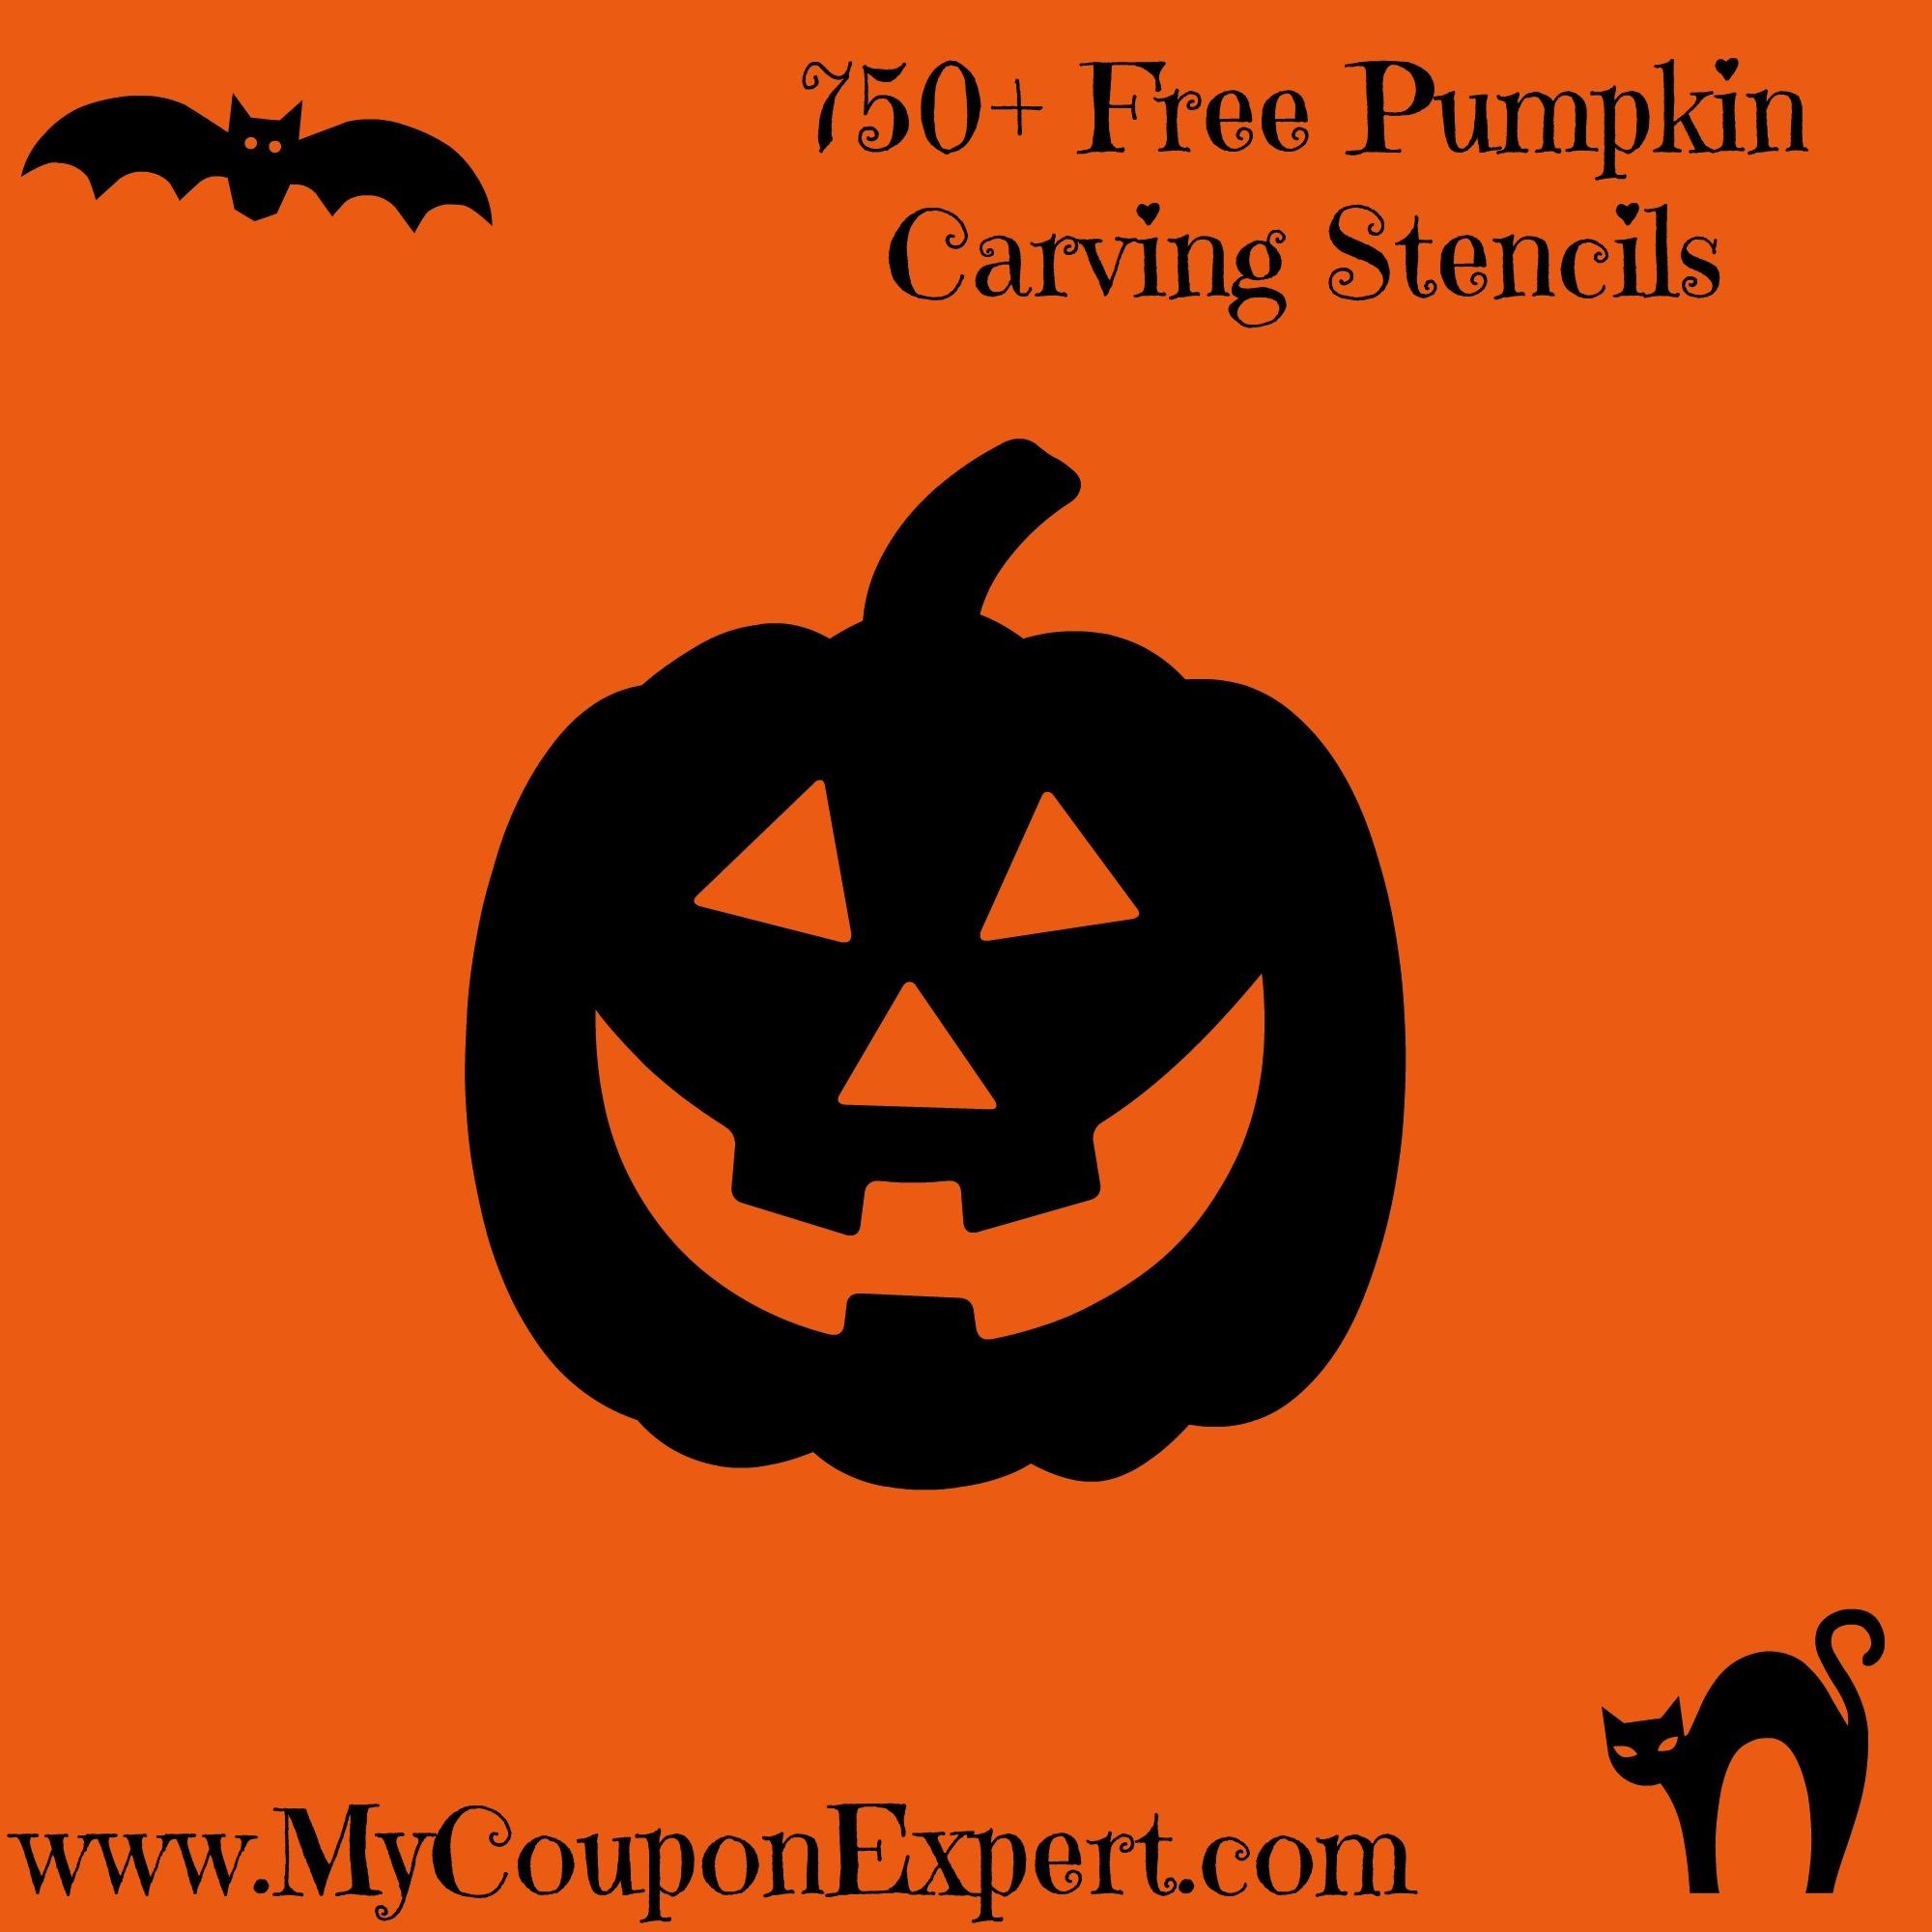 750+ Free Pumpkin Carving Stencils · - Pumpkin Carving Patterns Free Printable